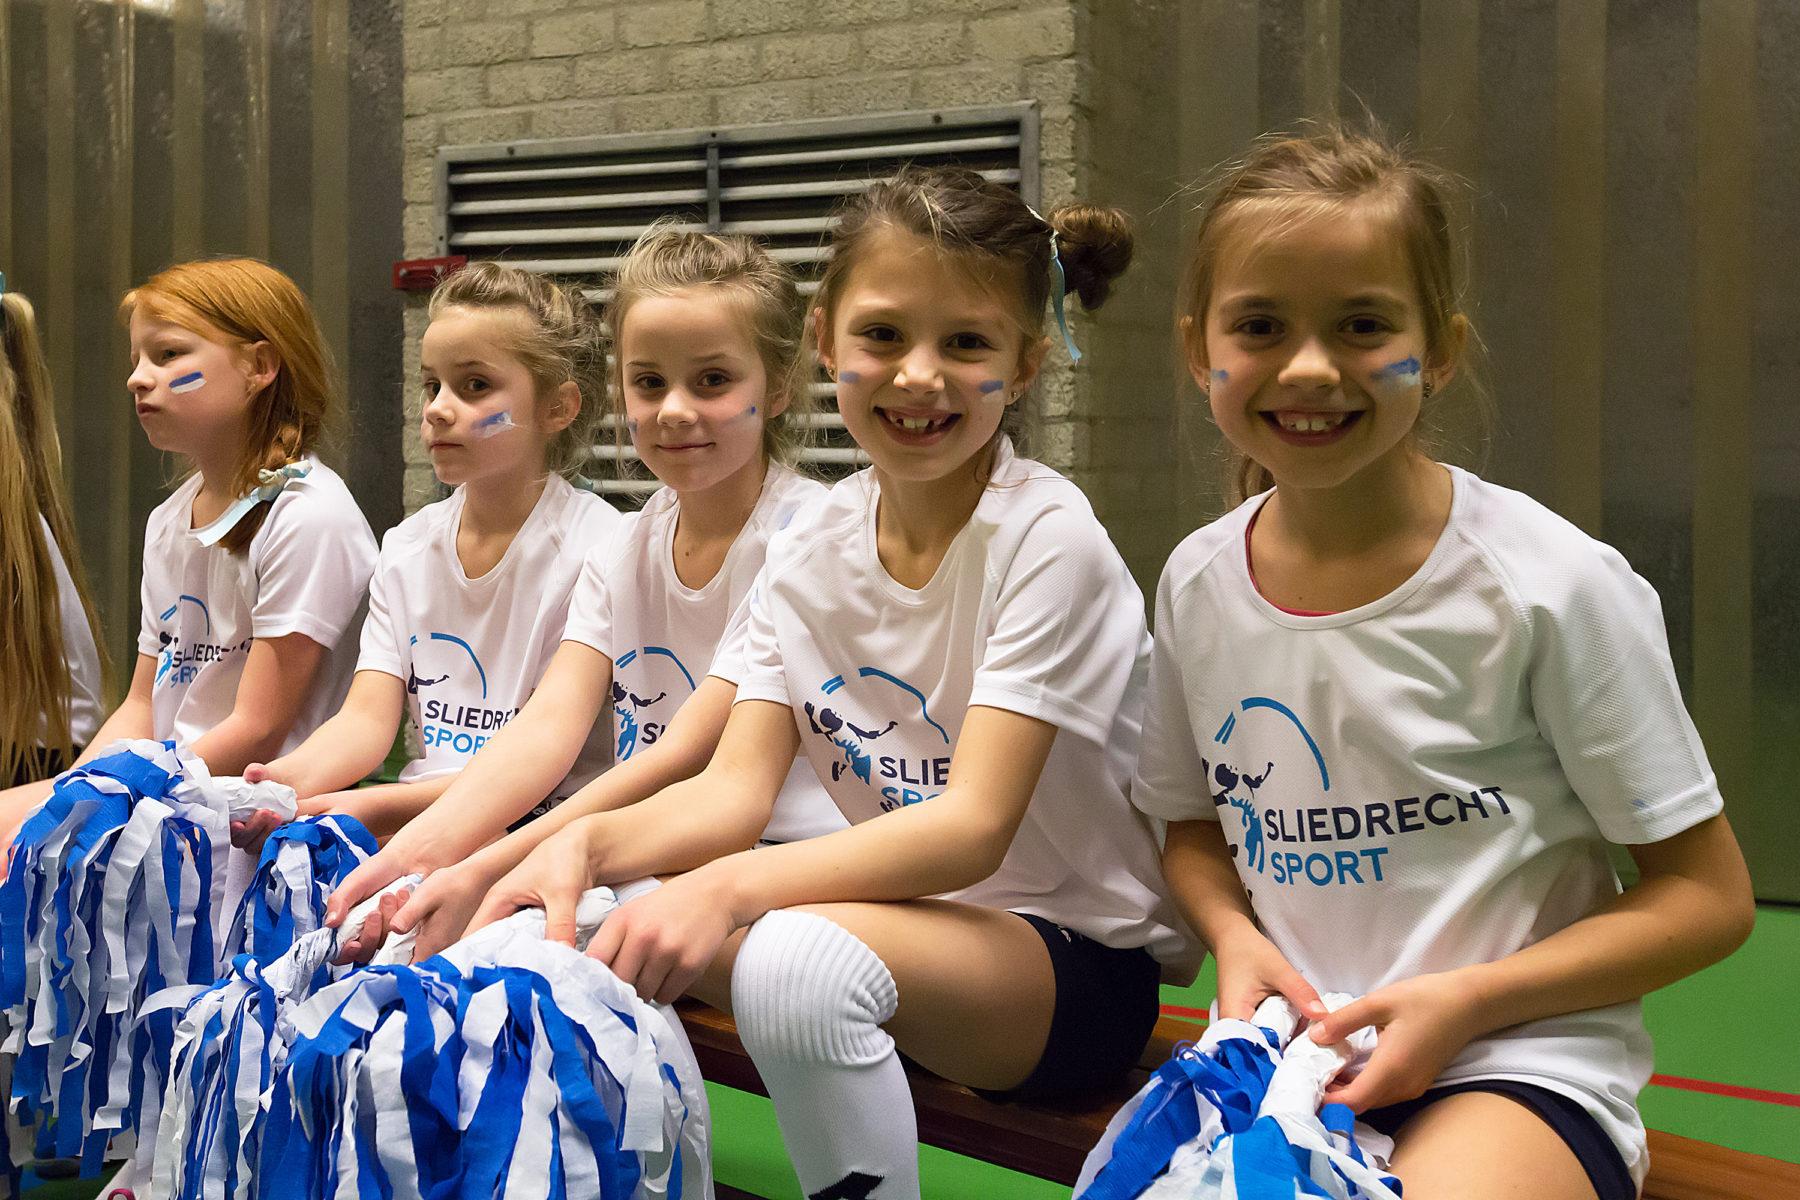 Vereniging Sliedrecht Sport